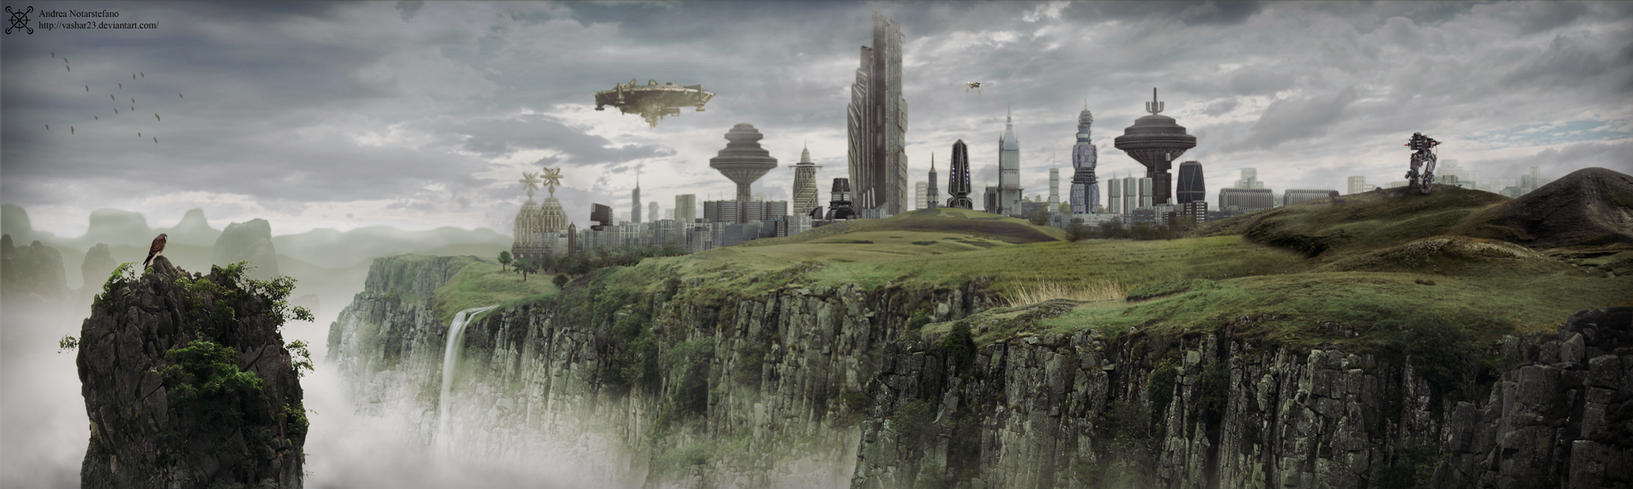 Plateau - Civilization by Vashar23